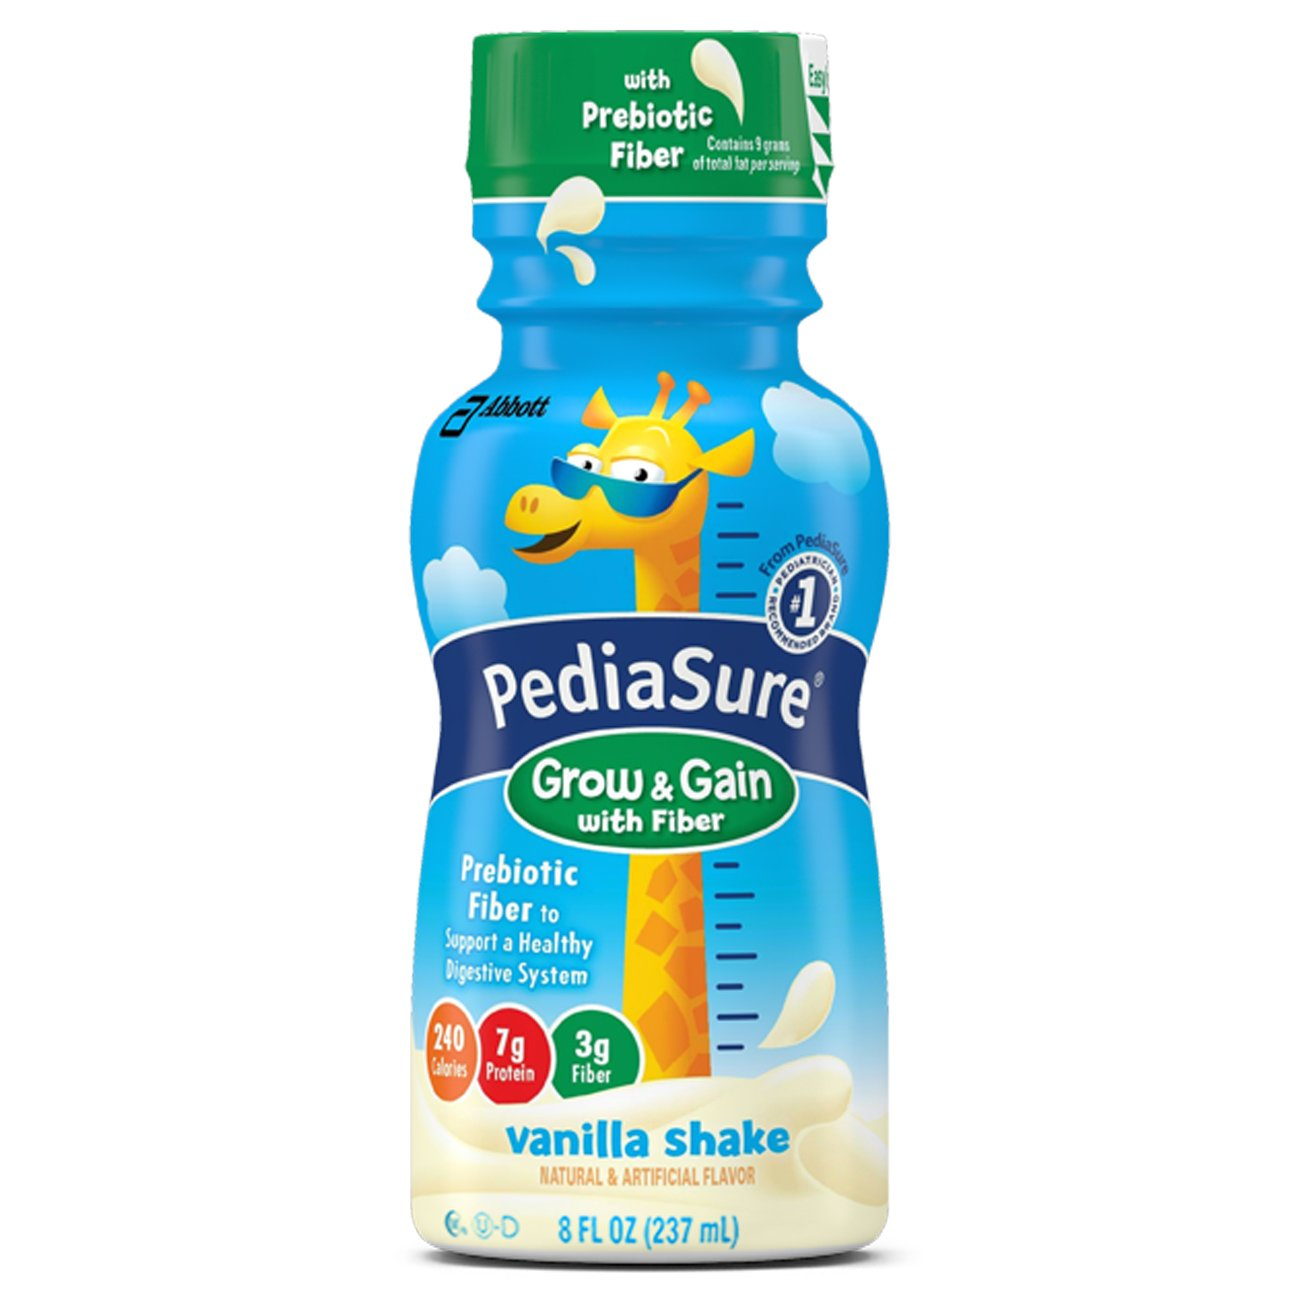 Pediashur, Little Baby for children: composition, reviews